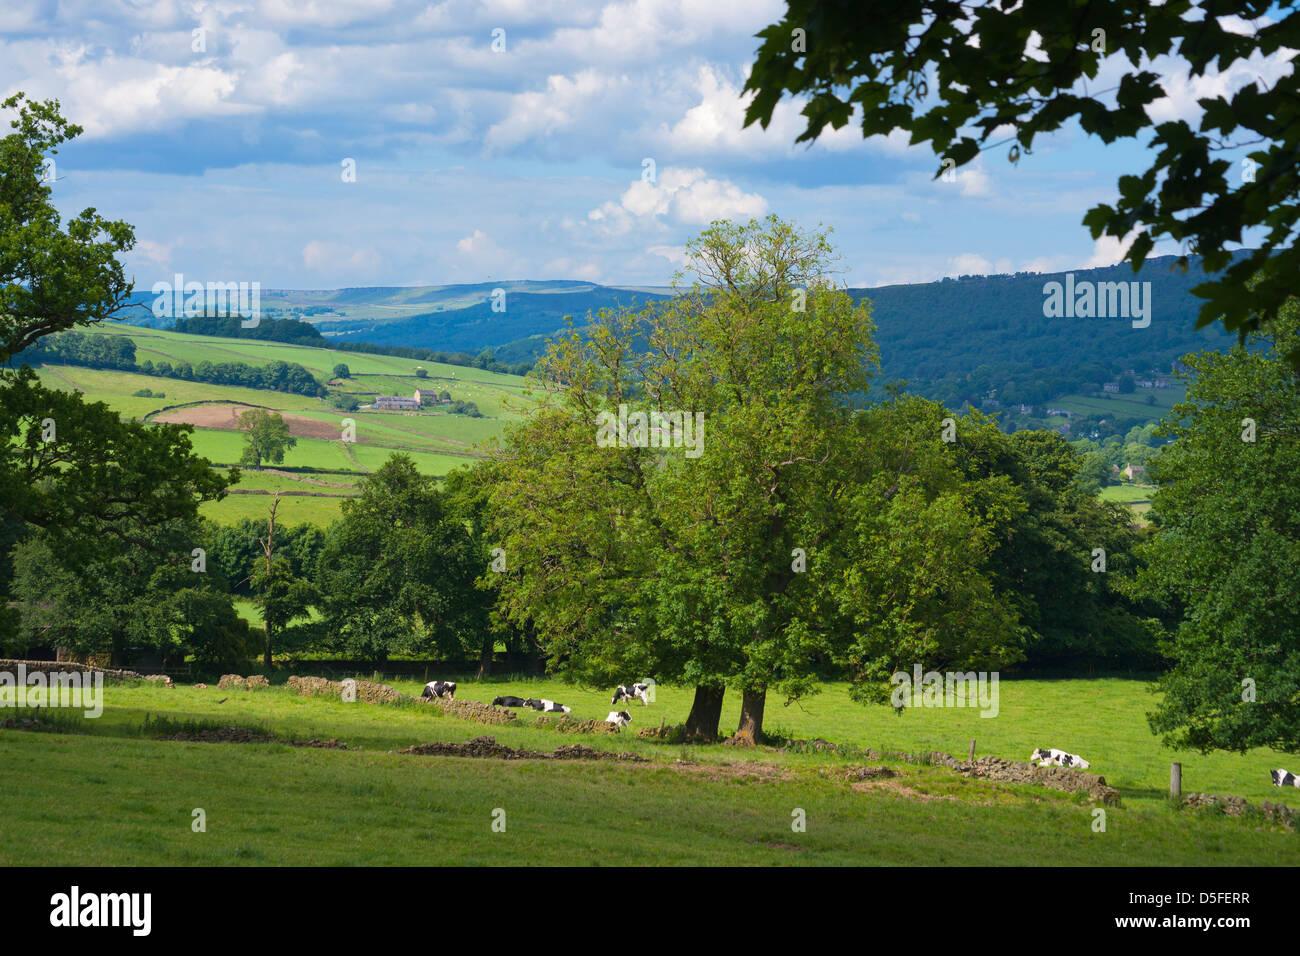 Derwent valley, from Plisley, Chatsworth, Derbyshire, Peak District, England - Stock Image